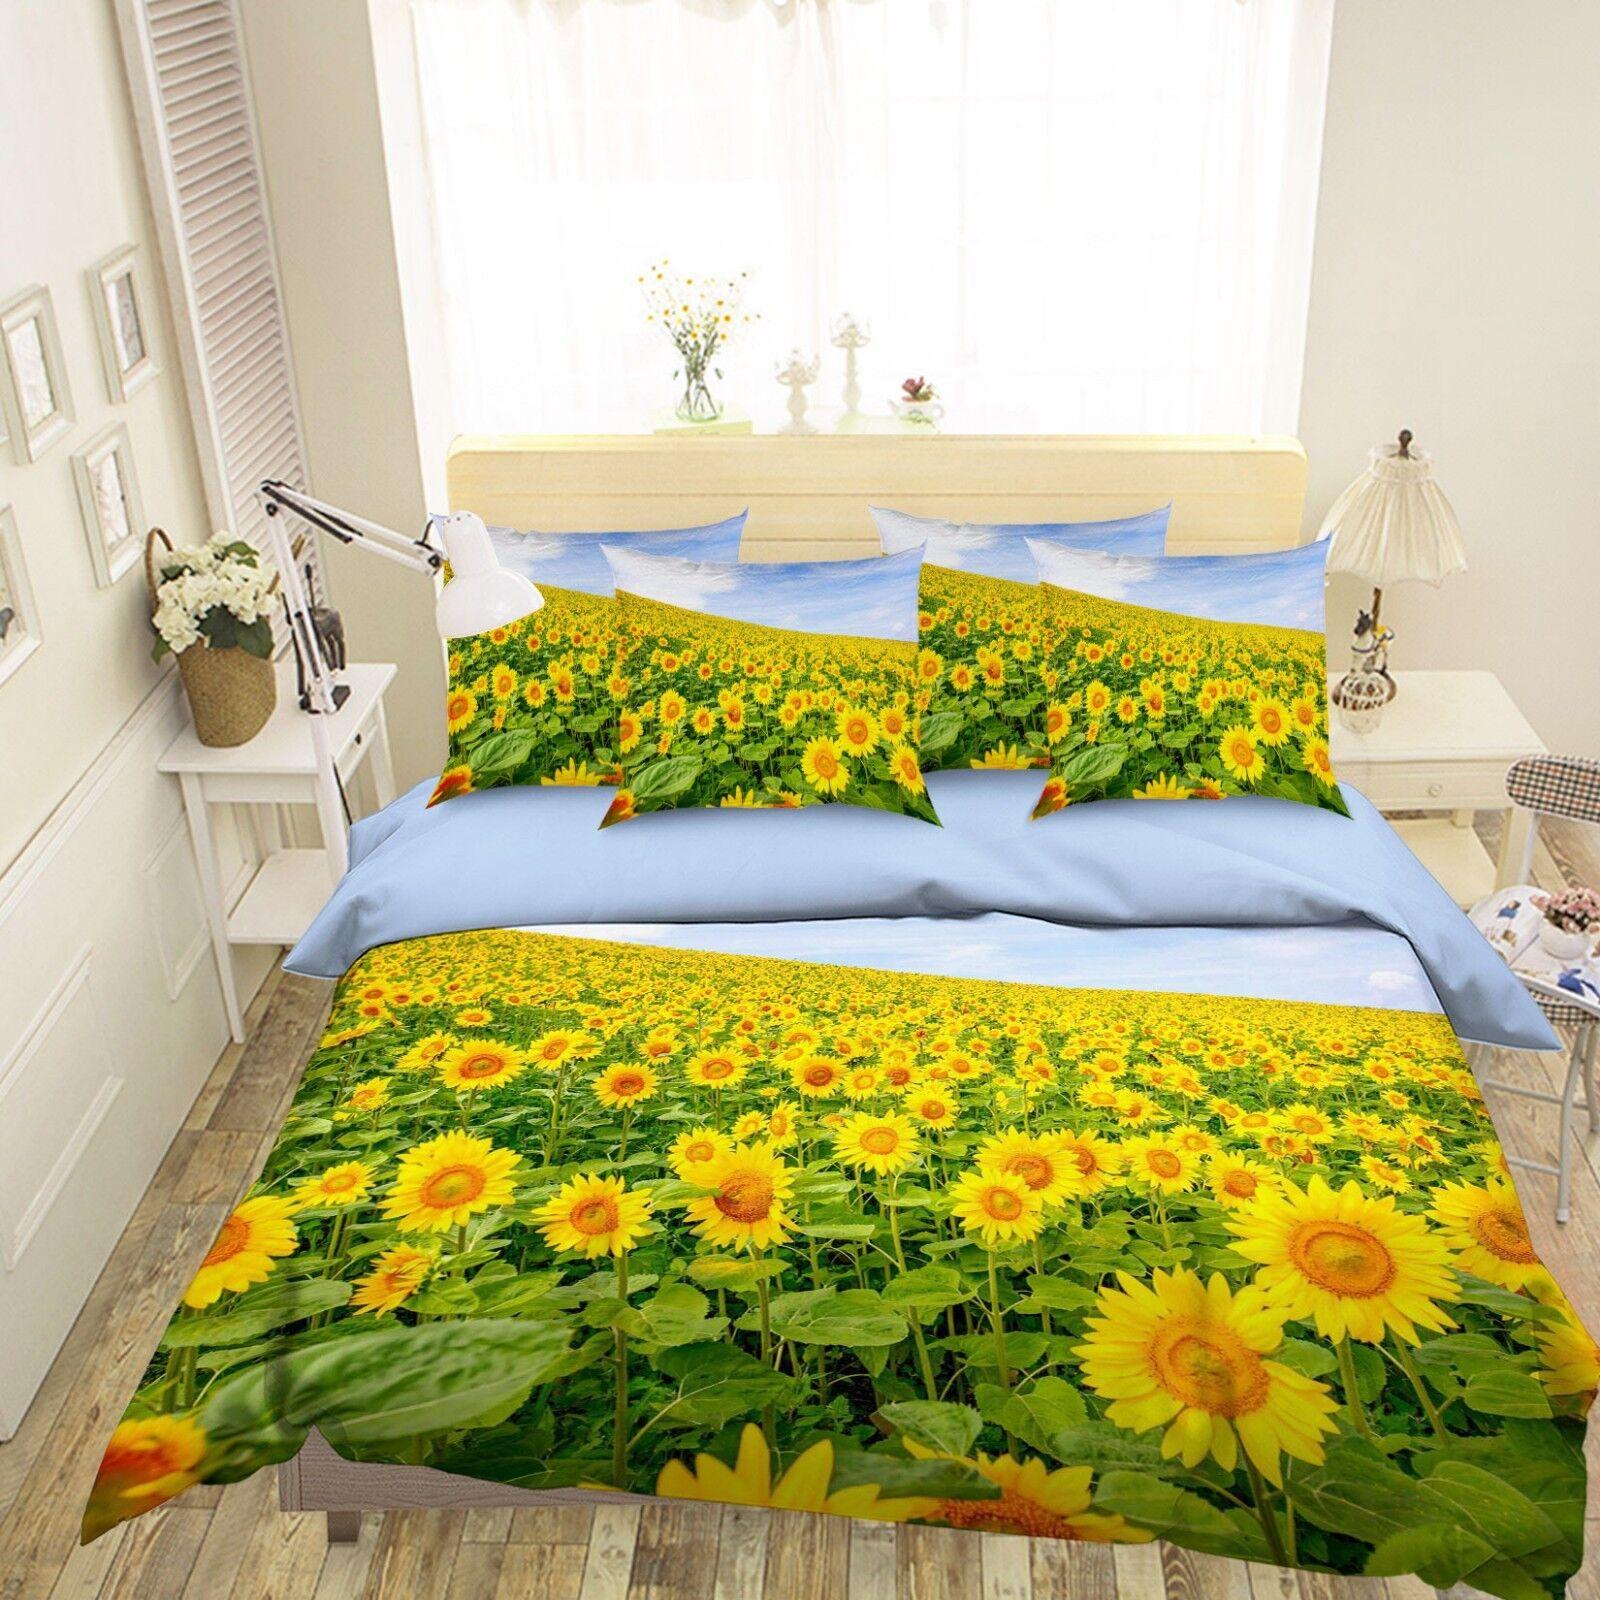 3D Sunflowers Plant 2 Bed Pillowcases Quilt Duvet Single Queen King US Summer